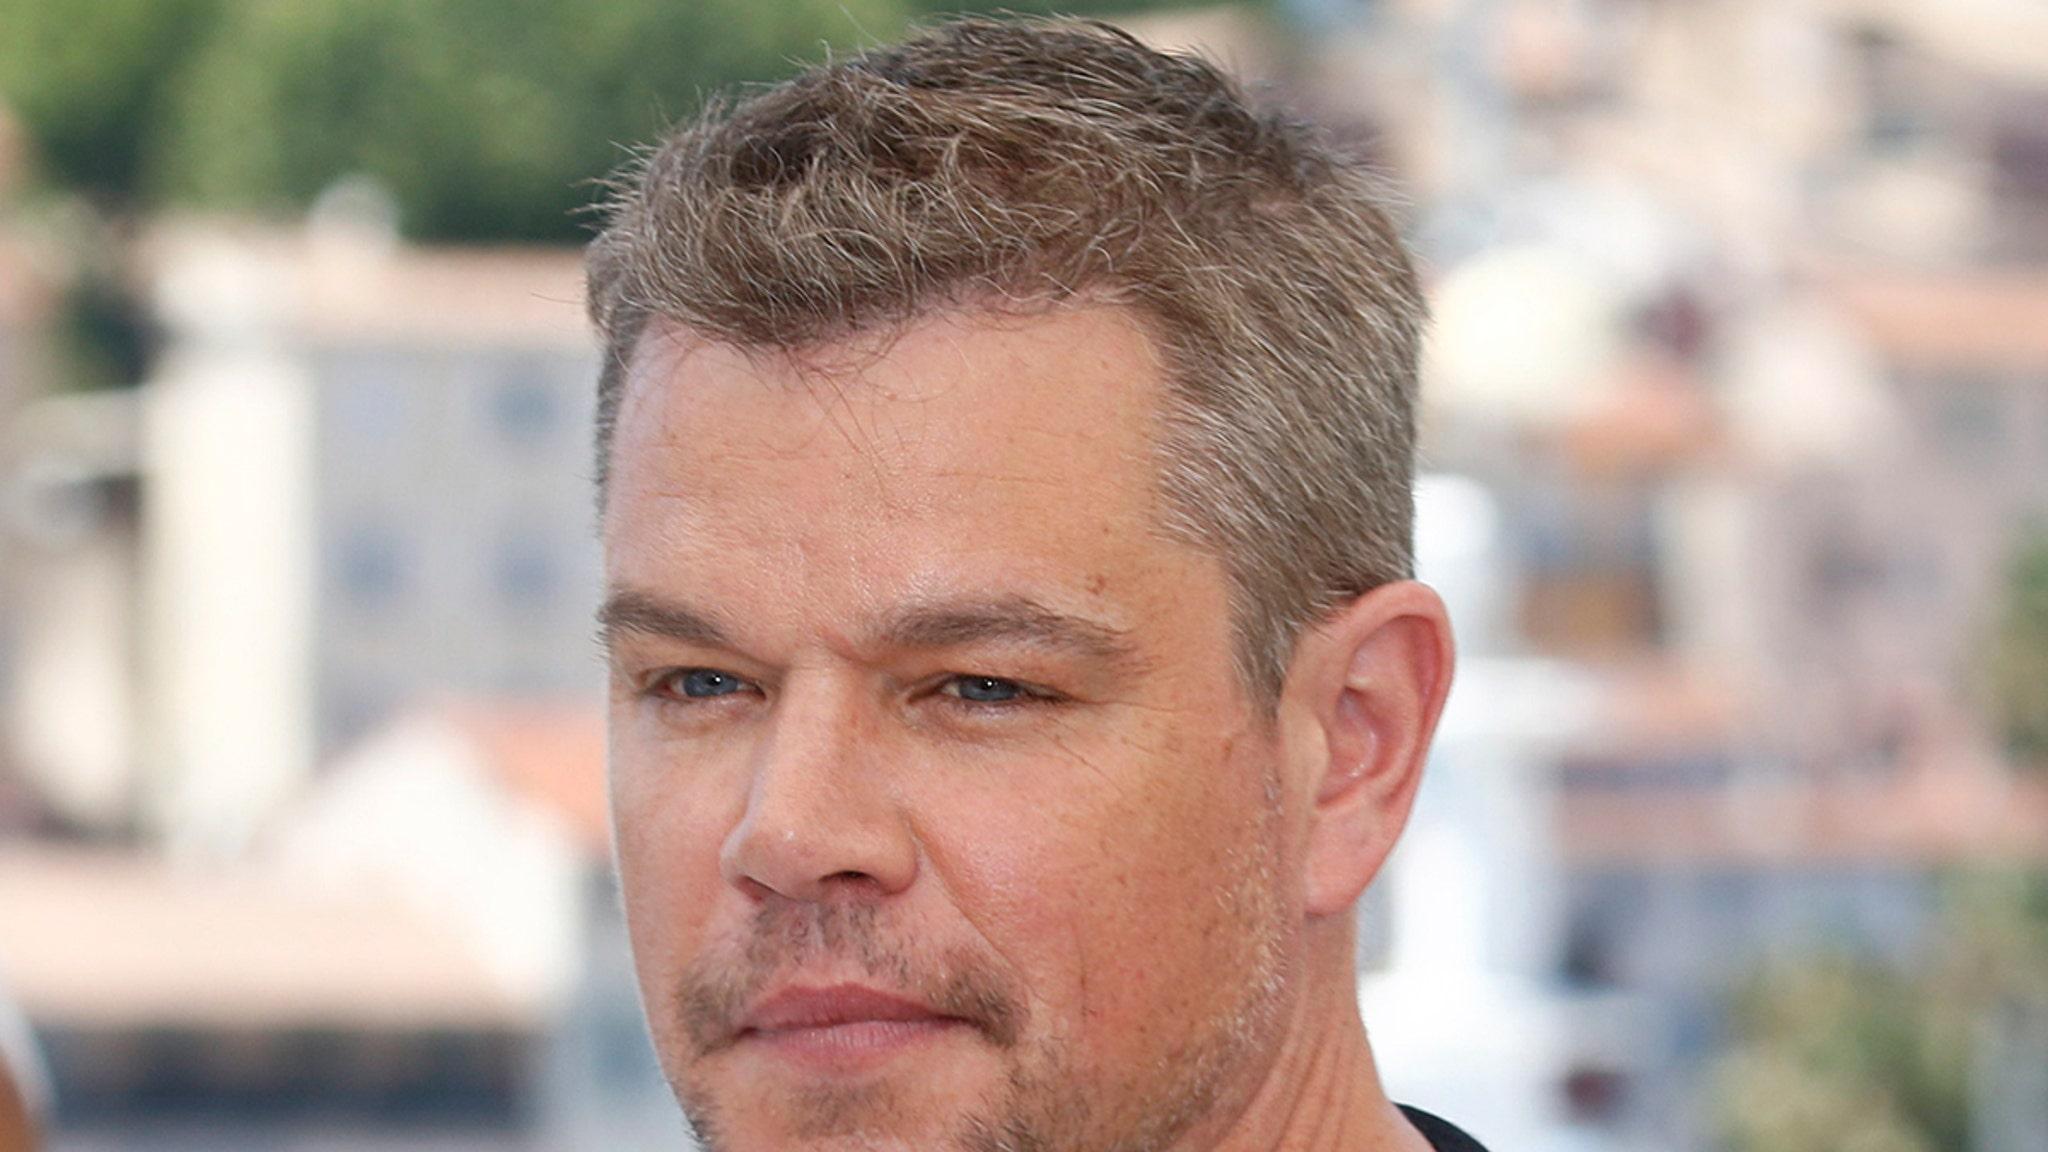 Matt Damon Insists He Never Used The Homophobic F-Word thumbnail